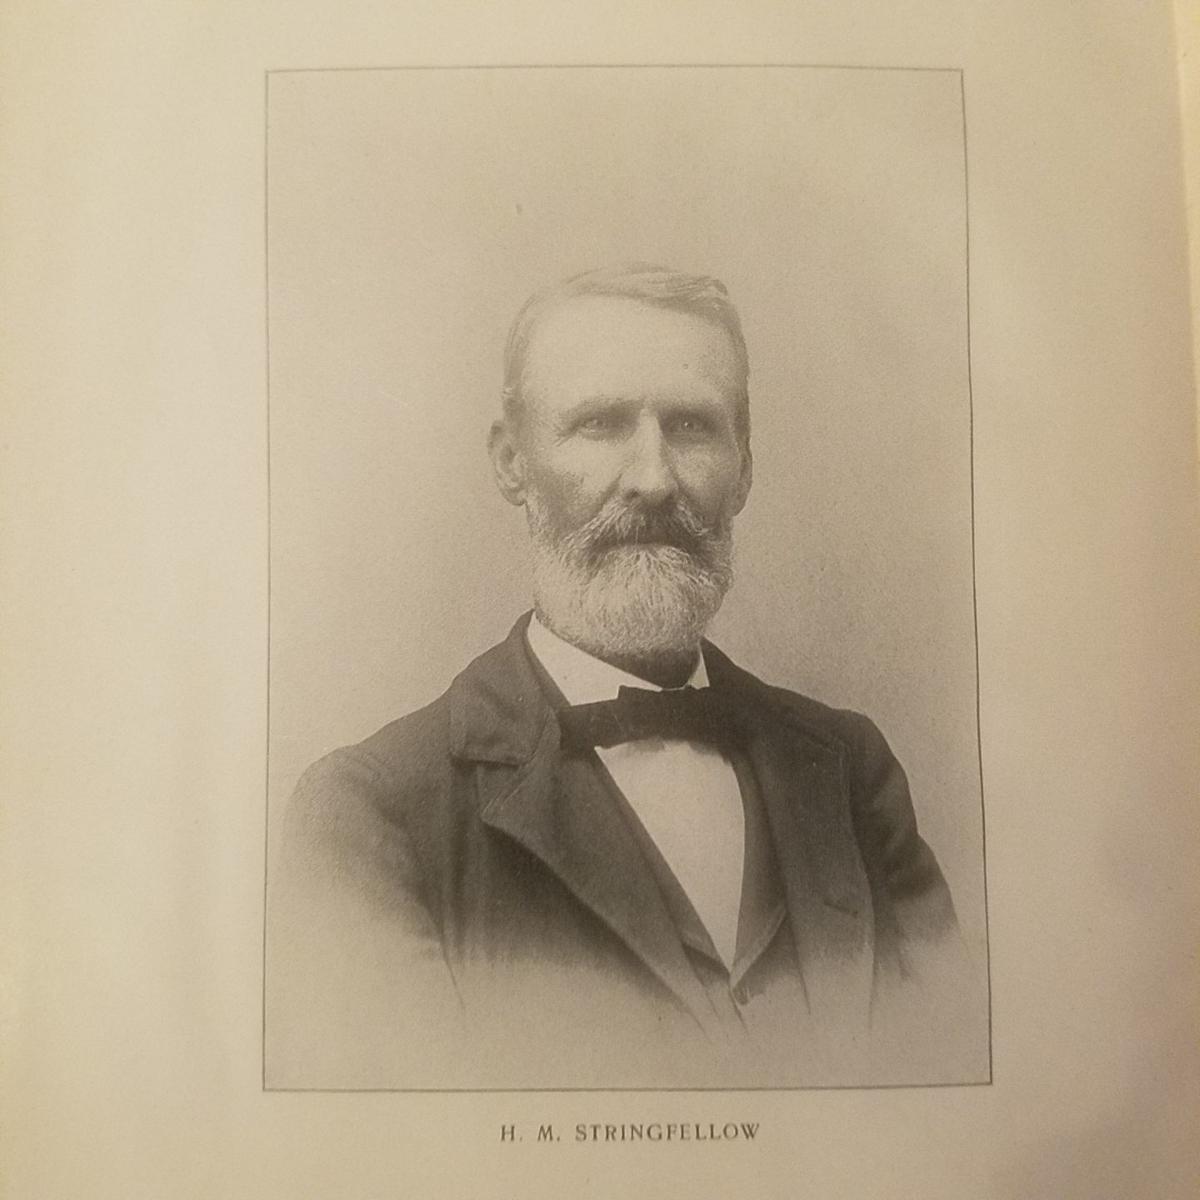 H.M. Stringfellow